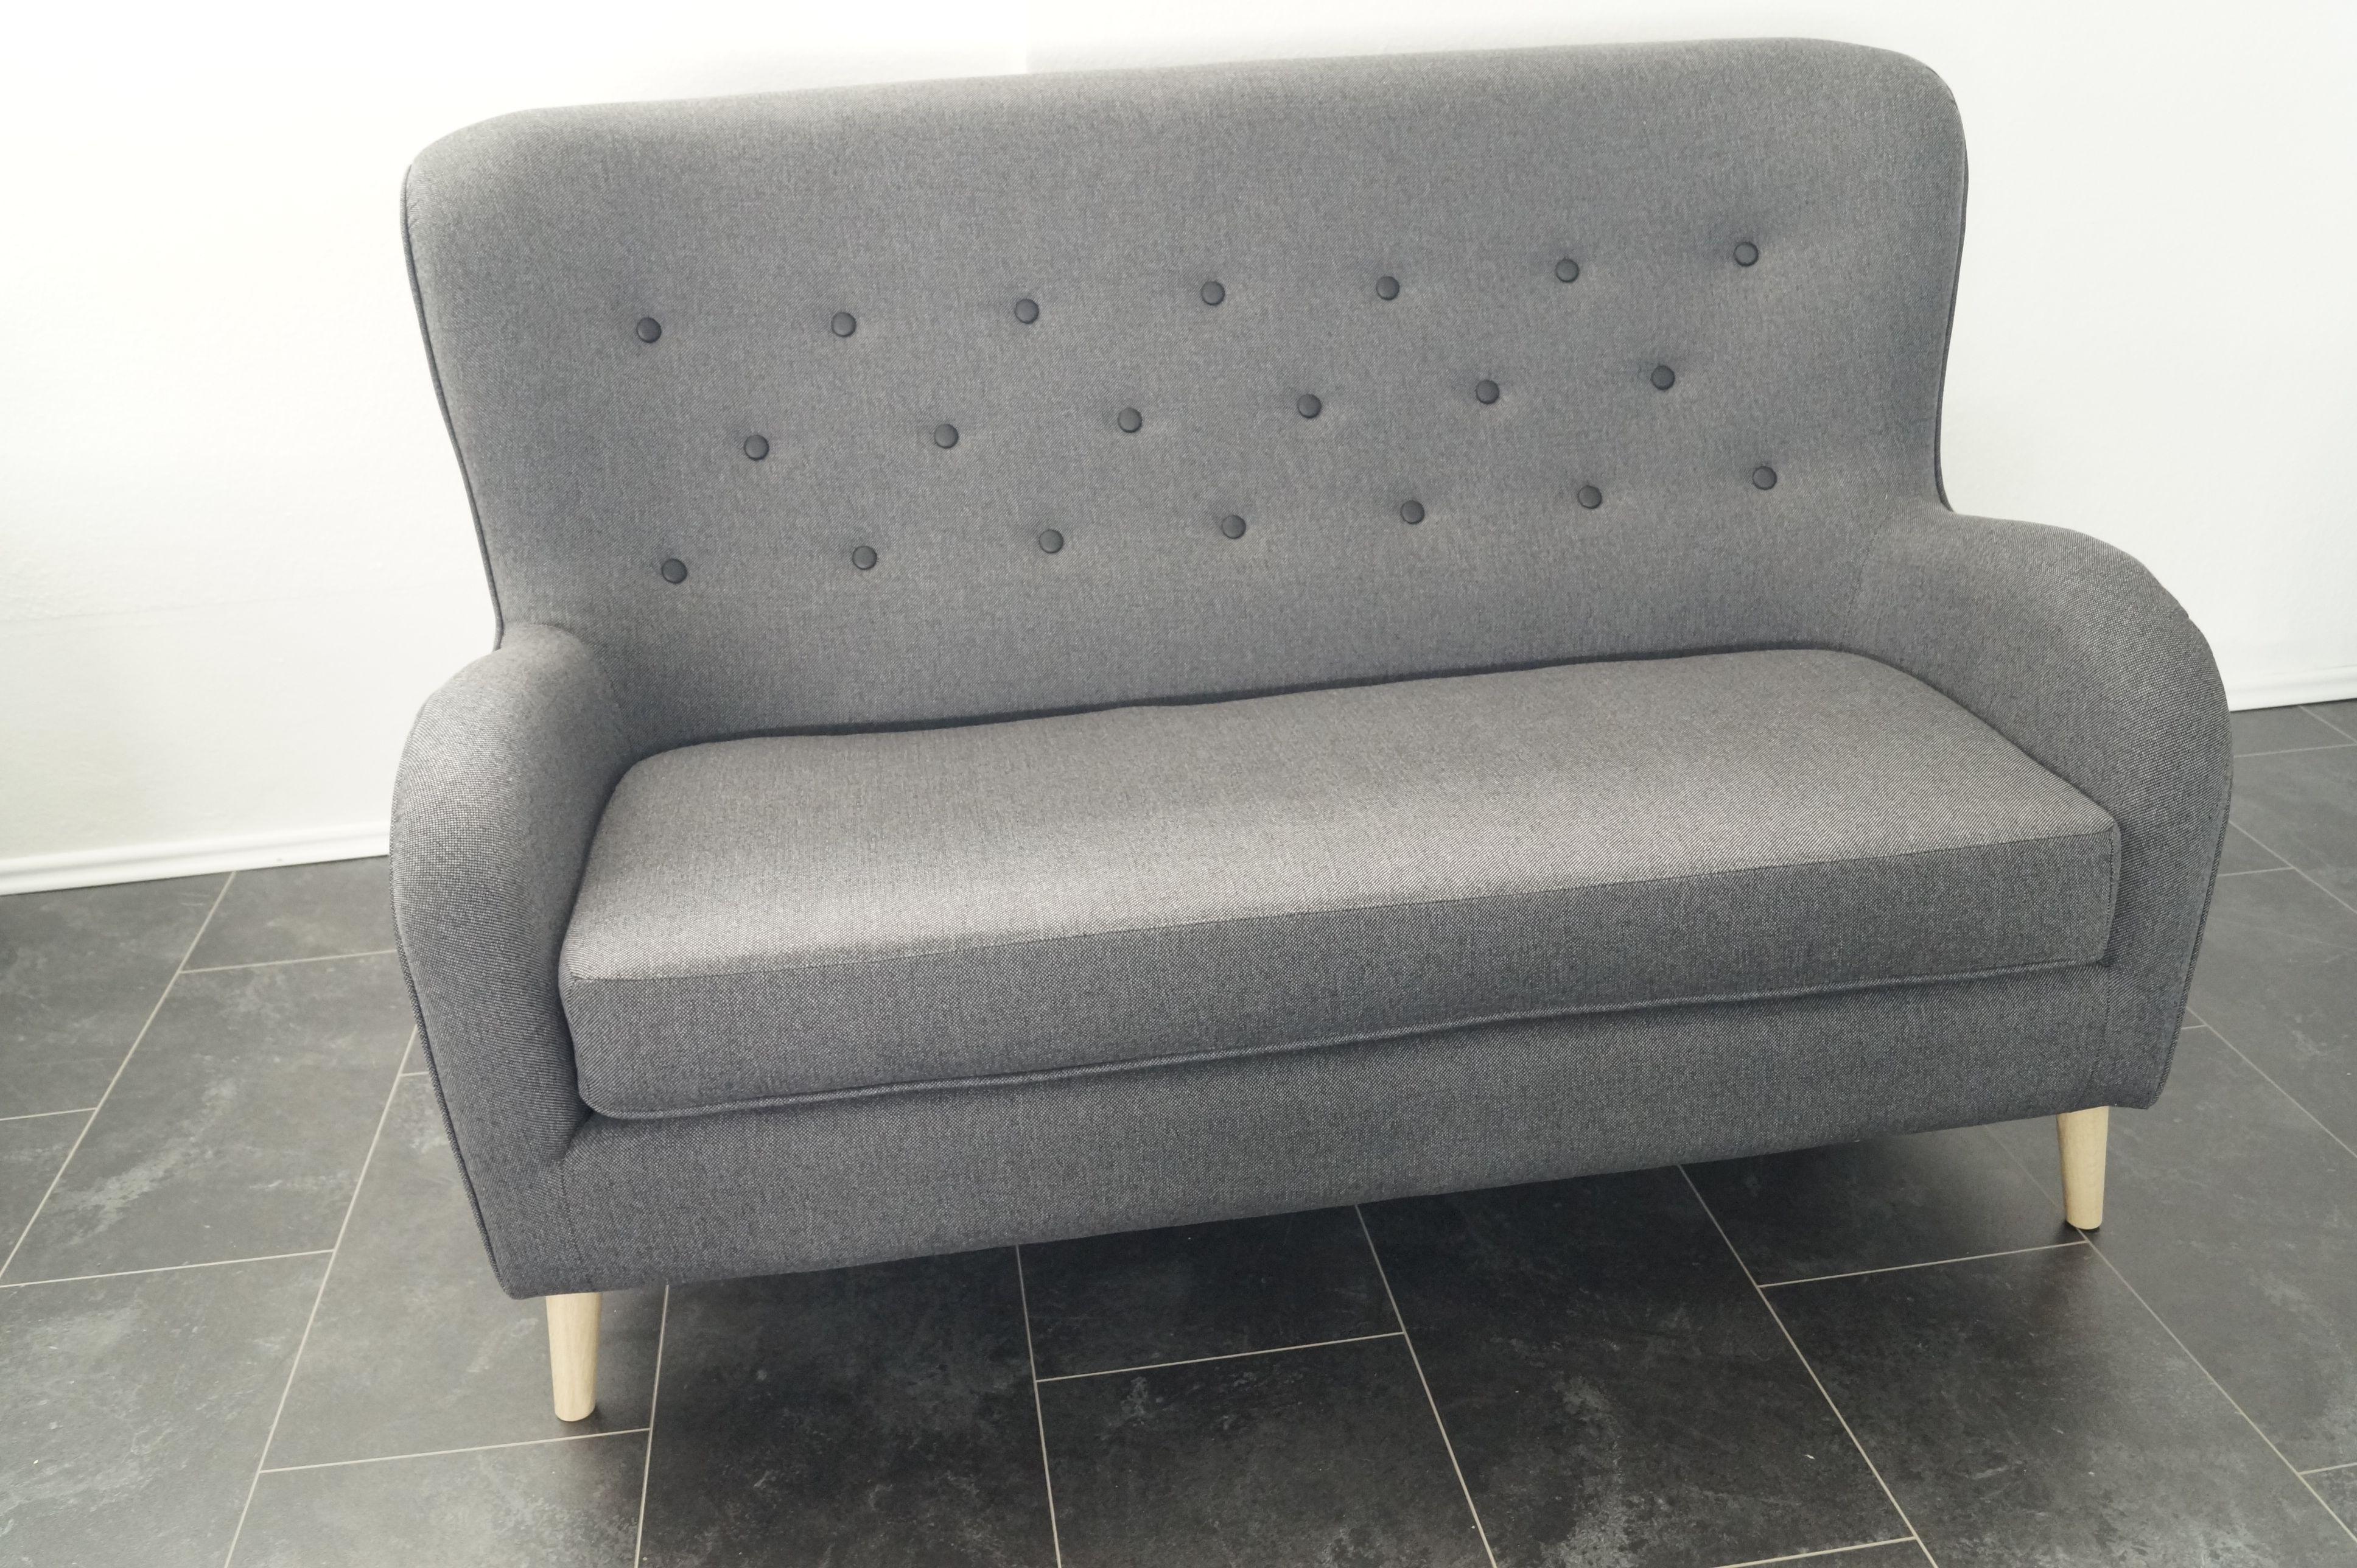 Polstermöbel leder fabrikverkauf  www.sofa-lagerverkauf.de Sofa-lagerverkauf , Sofa , Couch ,Sofa ...